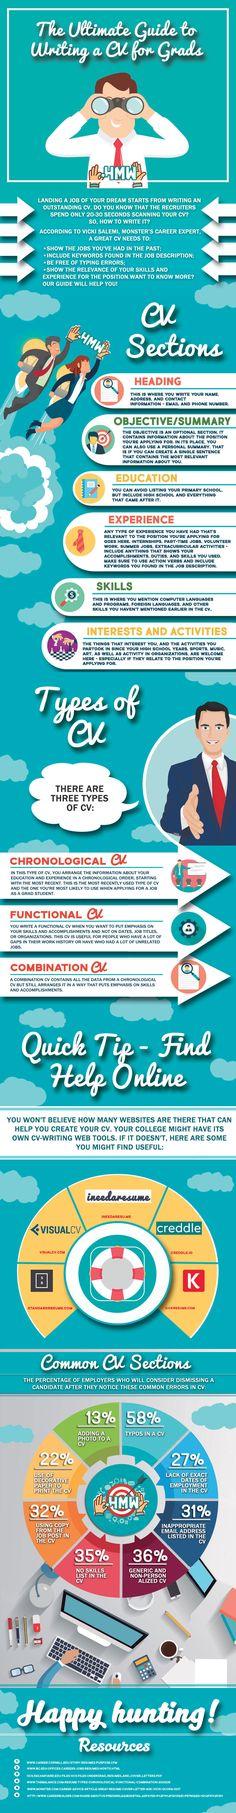 infographic CV tips